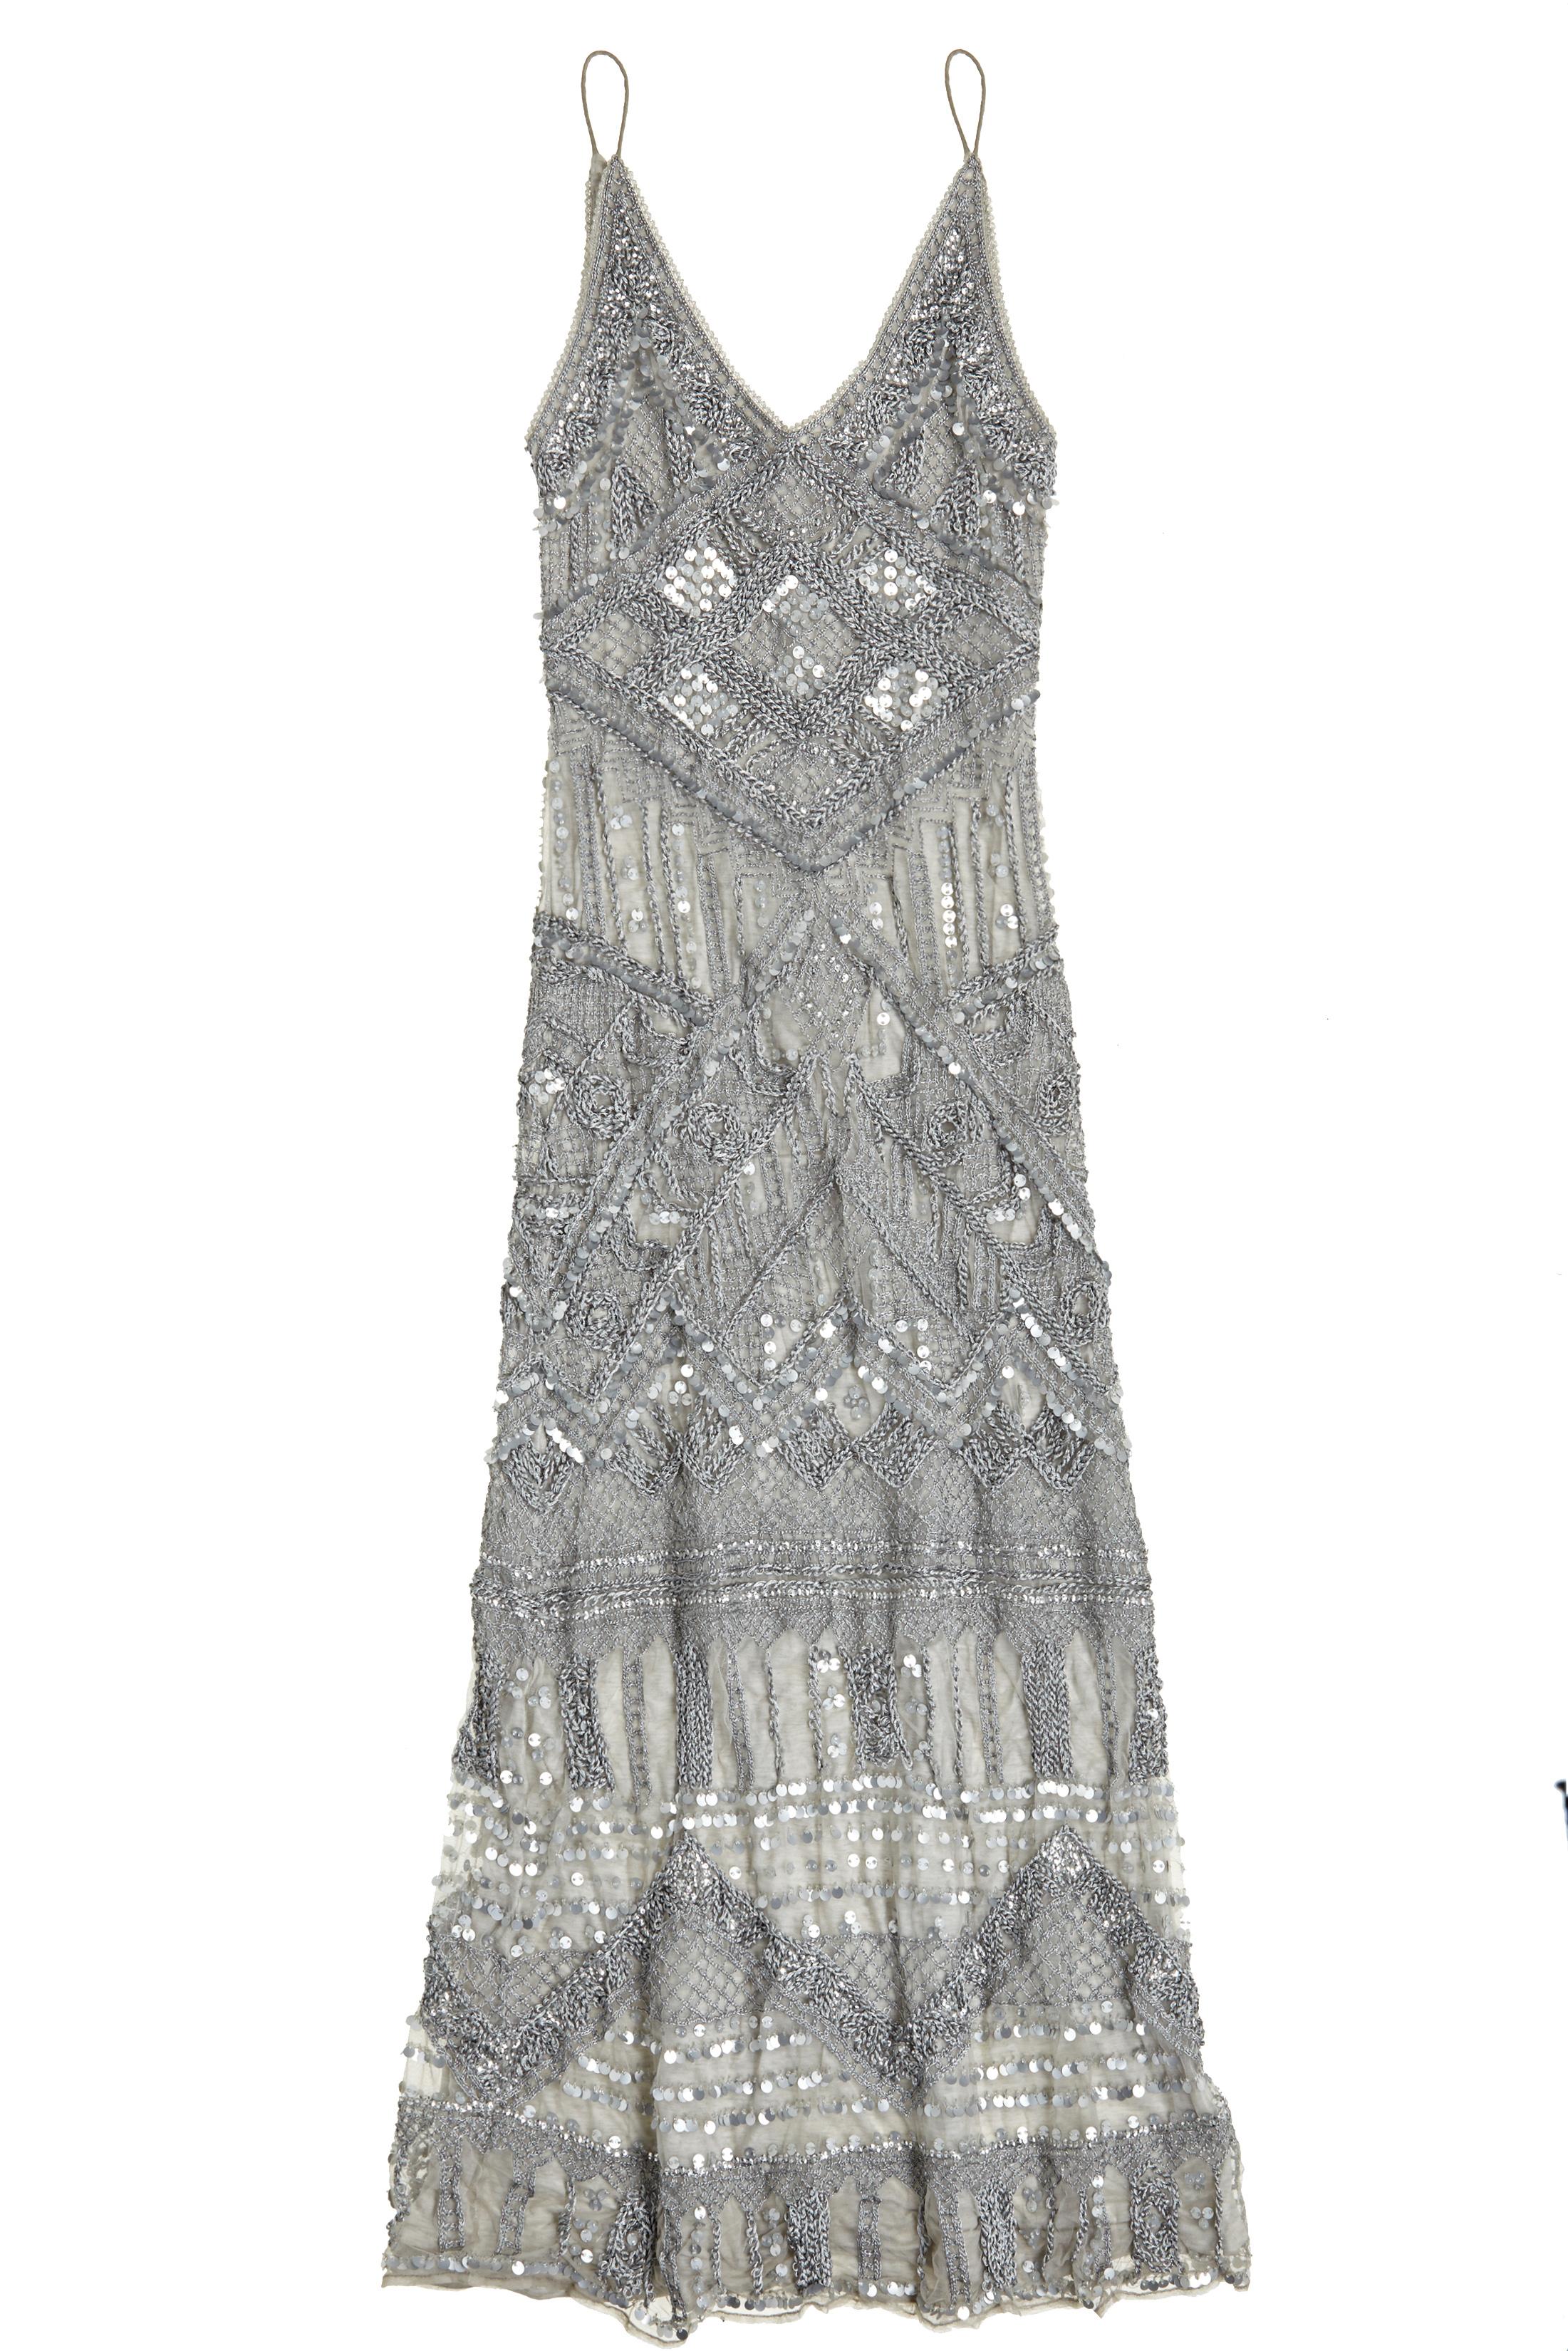 calypso-st-barth-bridal-brusse-dress-0315.jpg